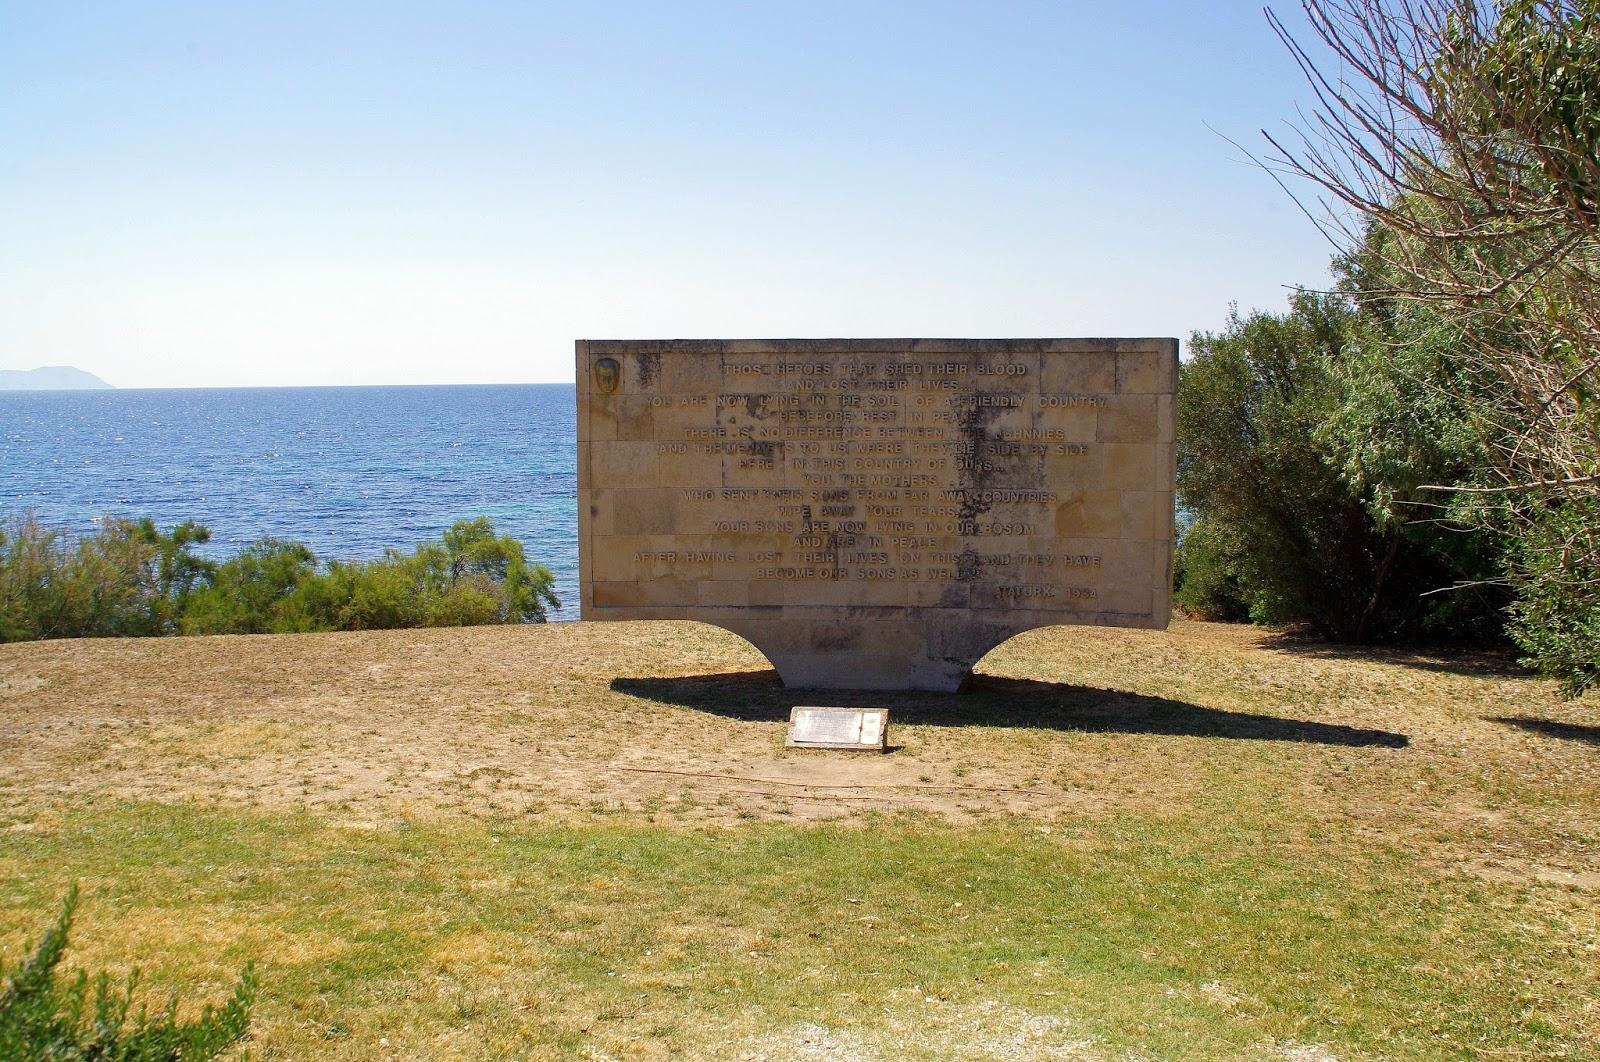 Ataturk Quote Memorial at Gallipoli